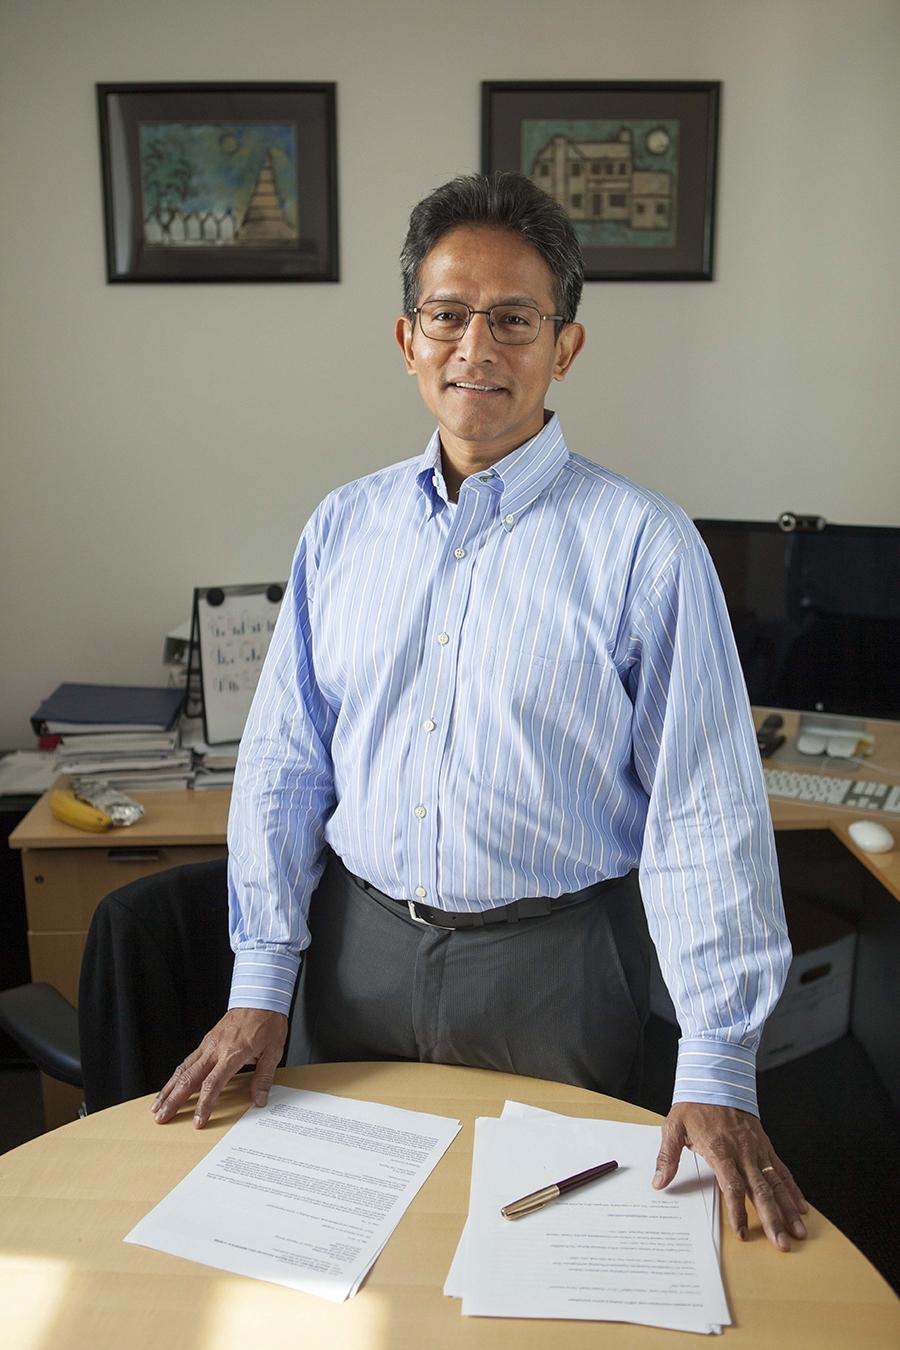 Dr. Timothy Hla